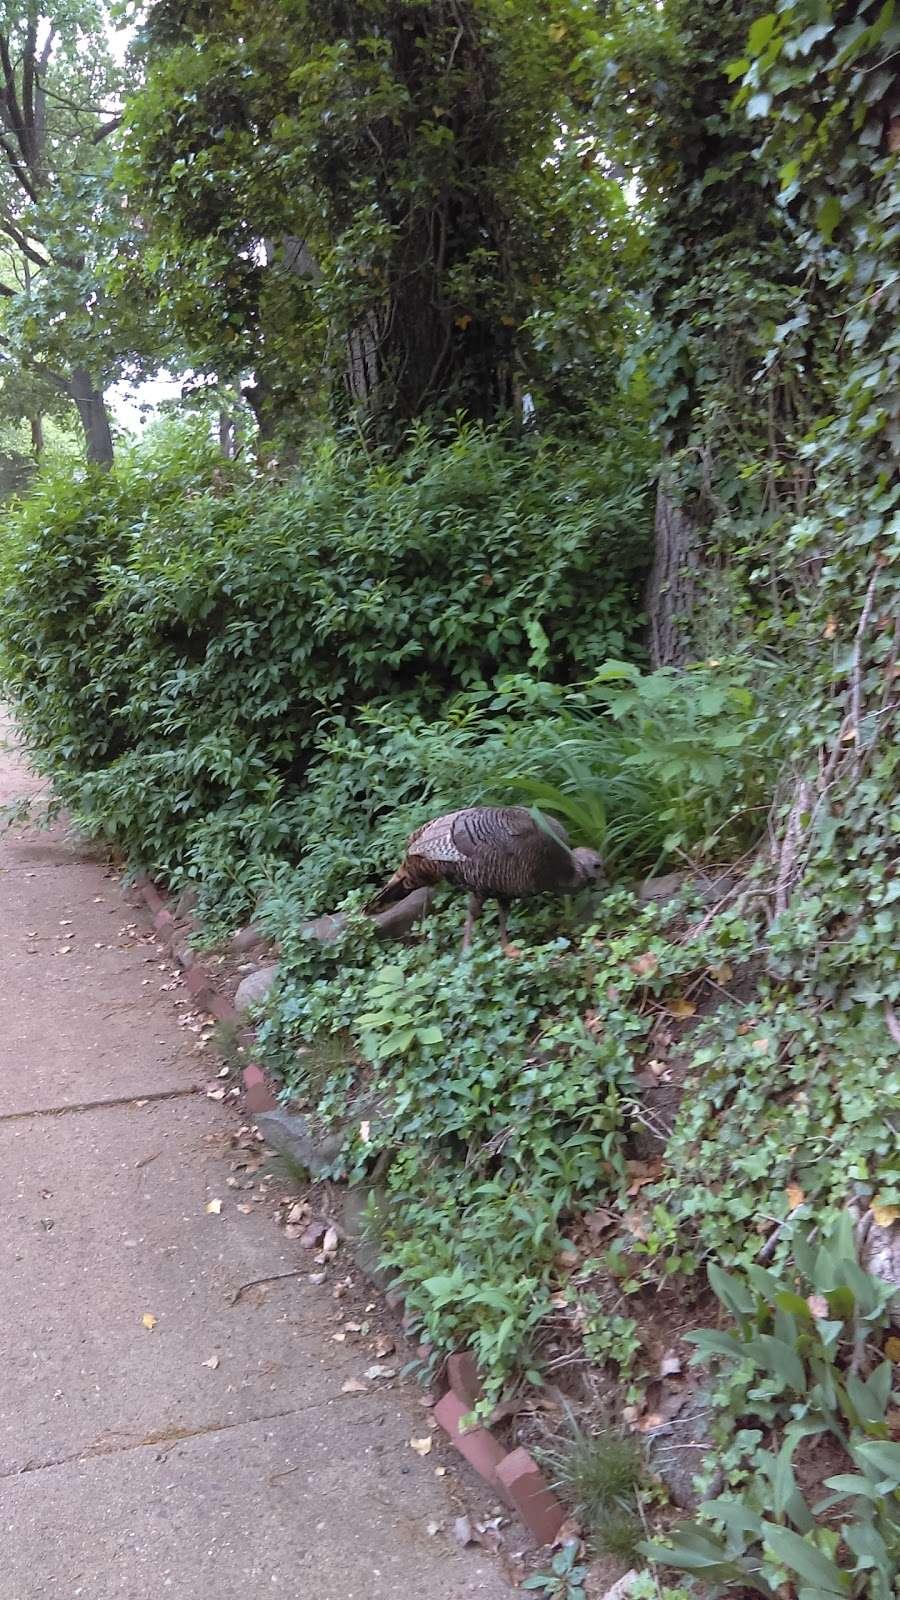 Windsor Park - park  | Photo 2 of 2 | Address: Teaneck, NJ 07666, USA | Phone: (201) 837-7130